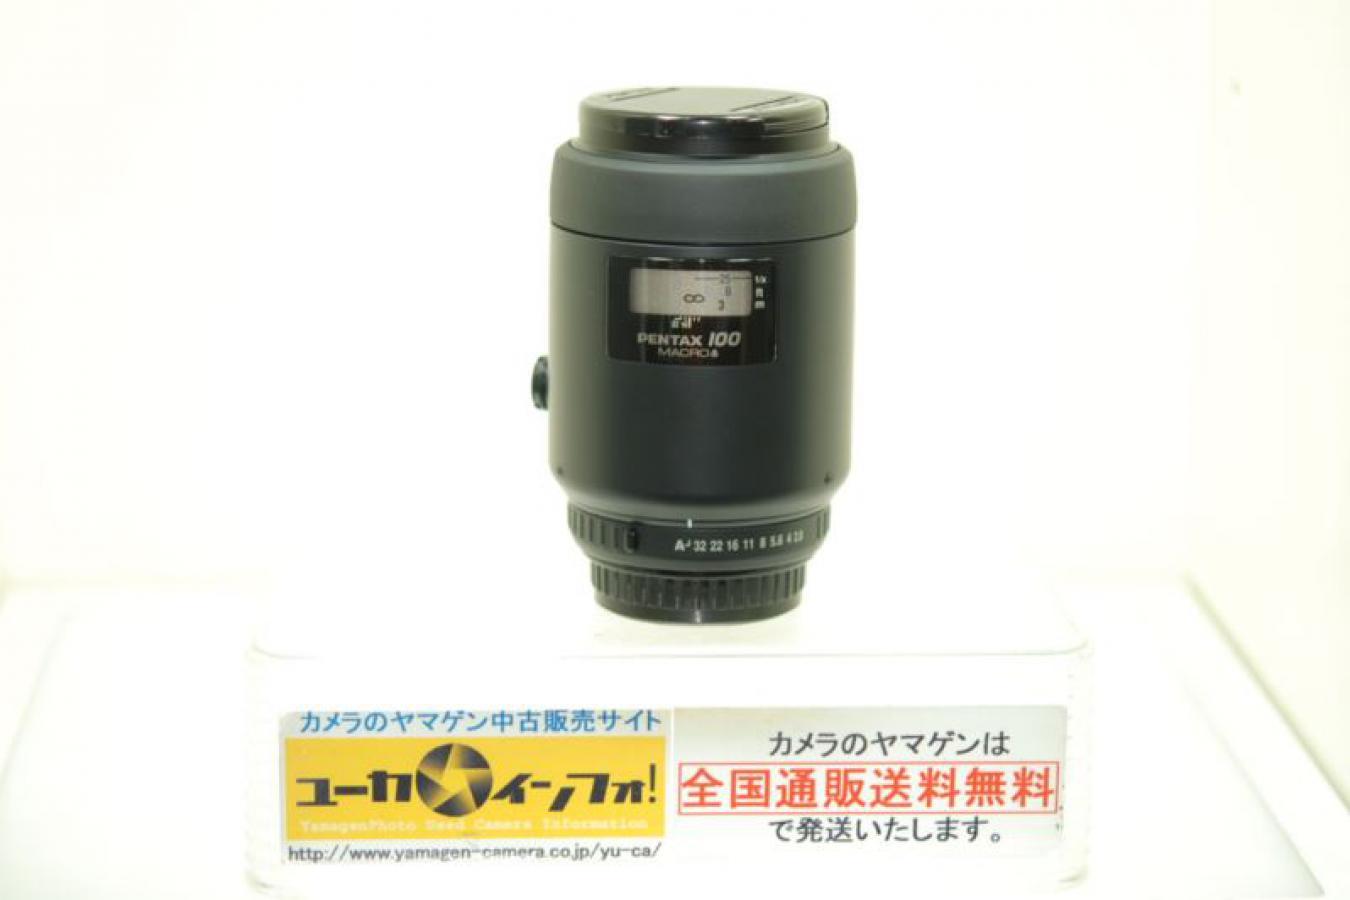 SMC PENTAX-FA 100mm F2.8 マクロ